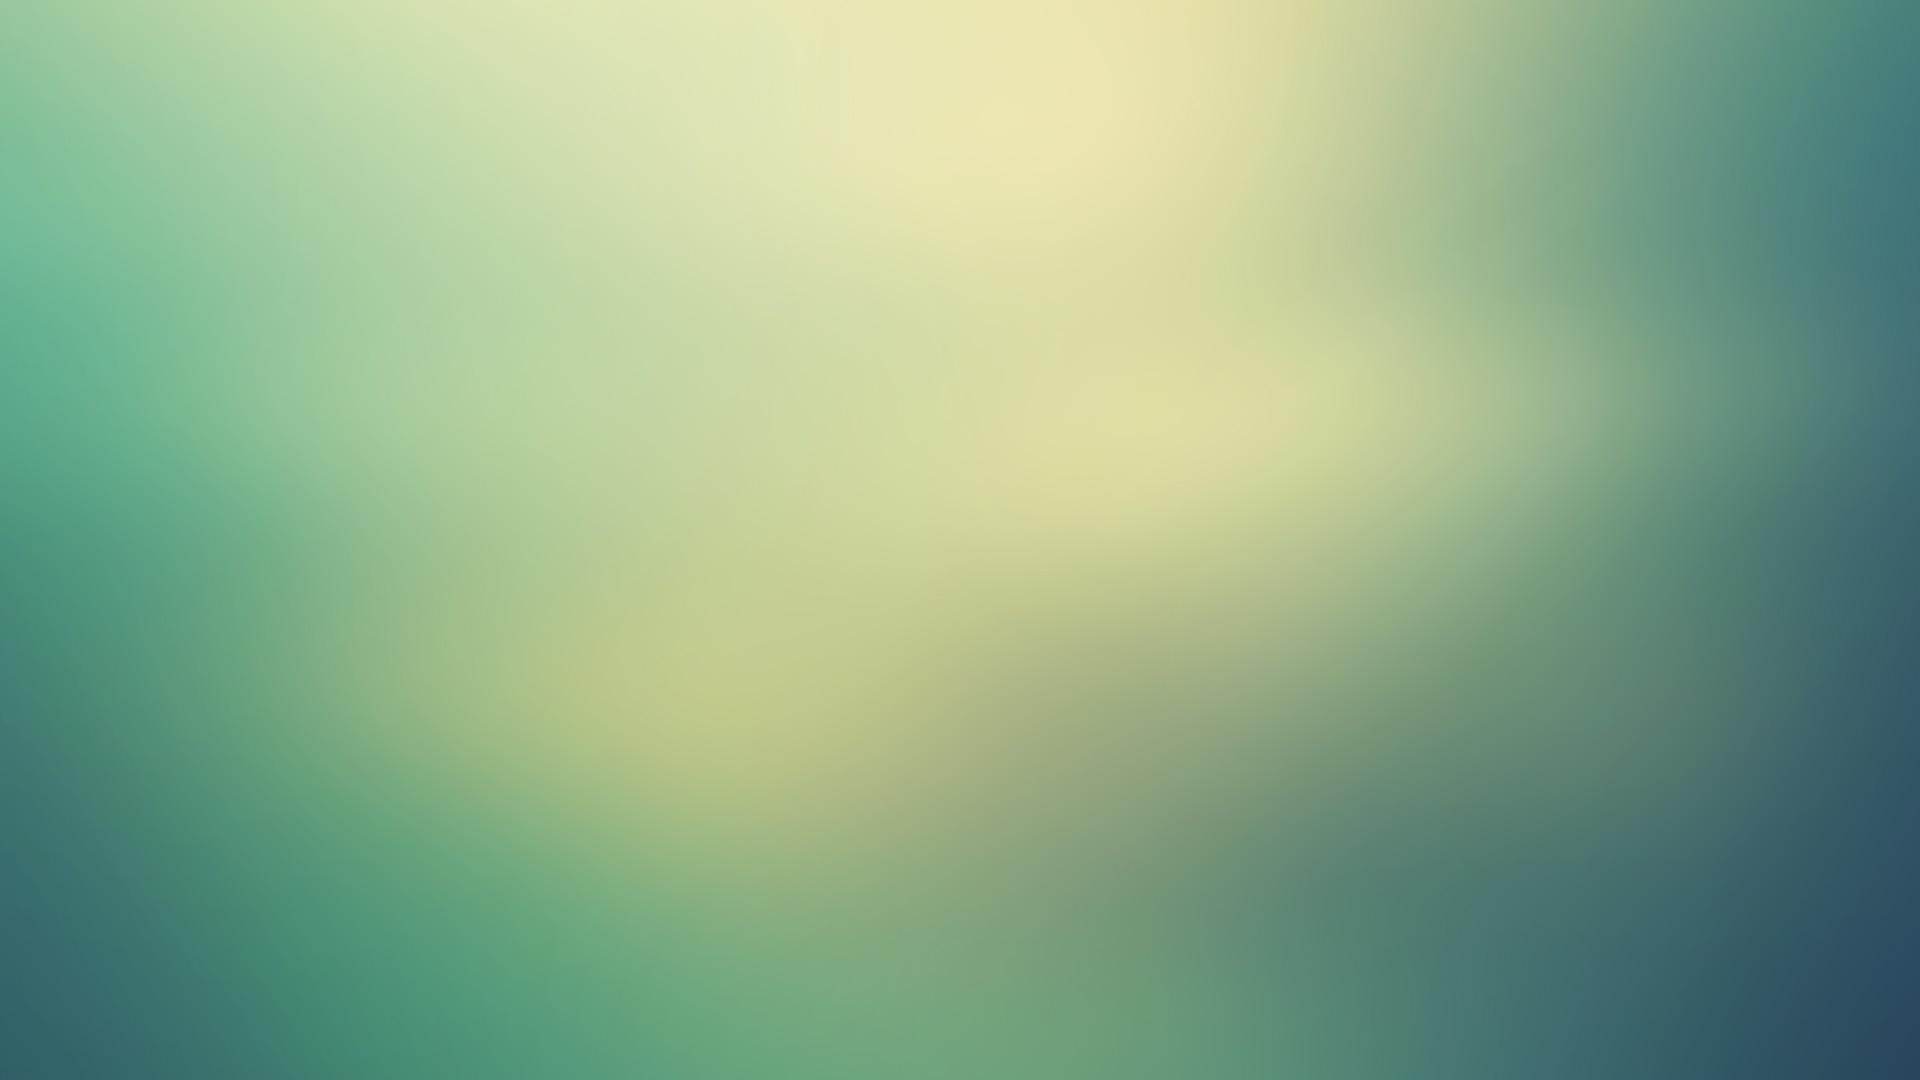 Minecraft Wallpaper Hd Download Blur Wallpapers Hd Download Free Pixelstalk Net